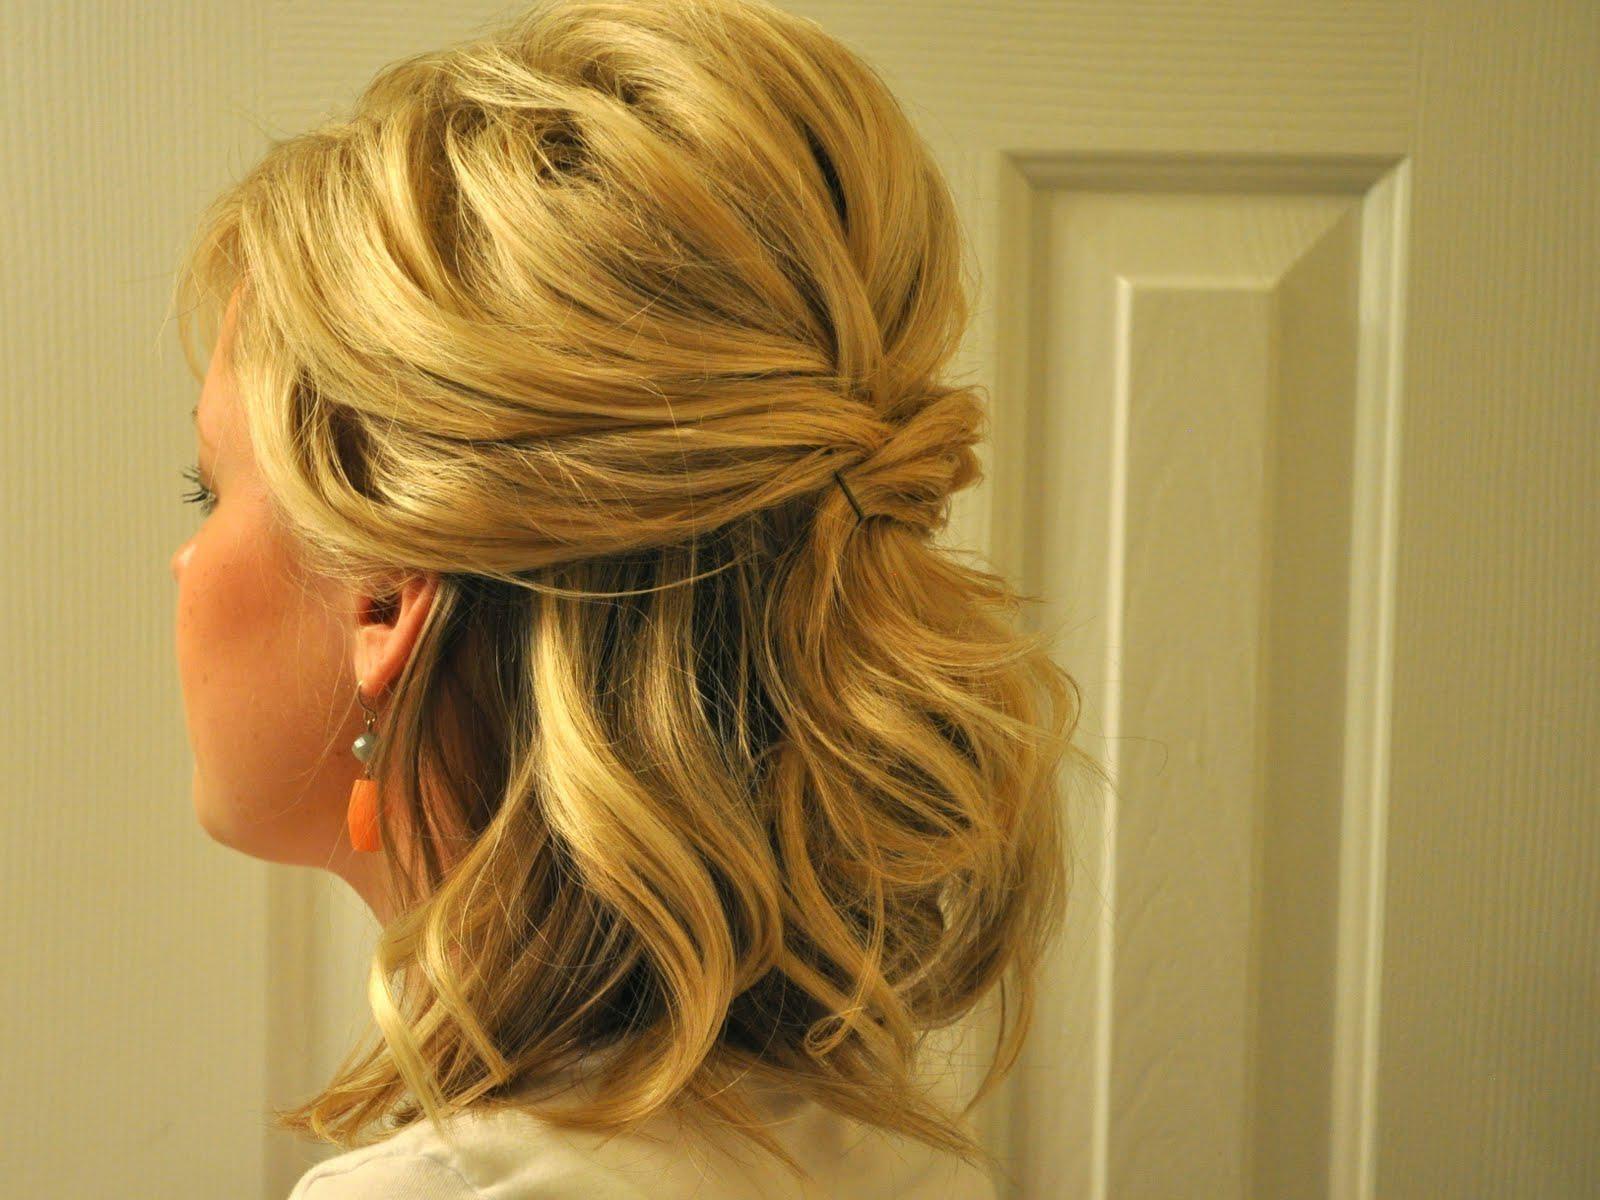 Bridesmaid Hairstyles For Medium Length Hair